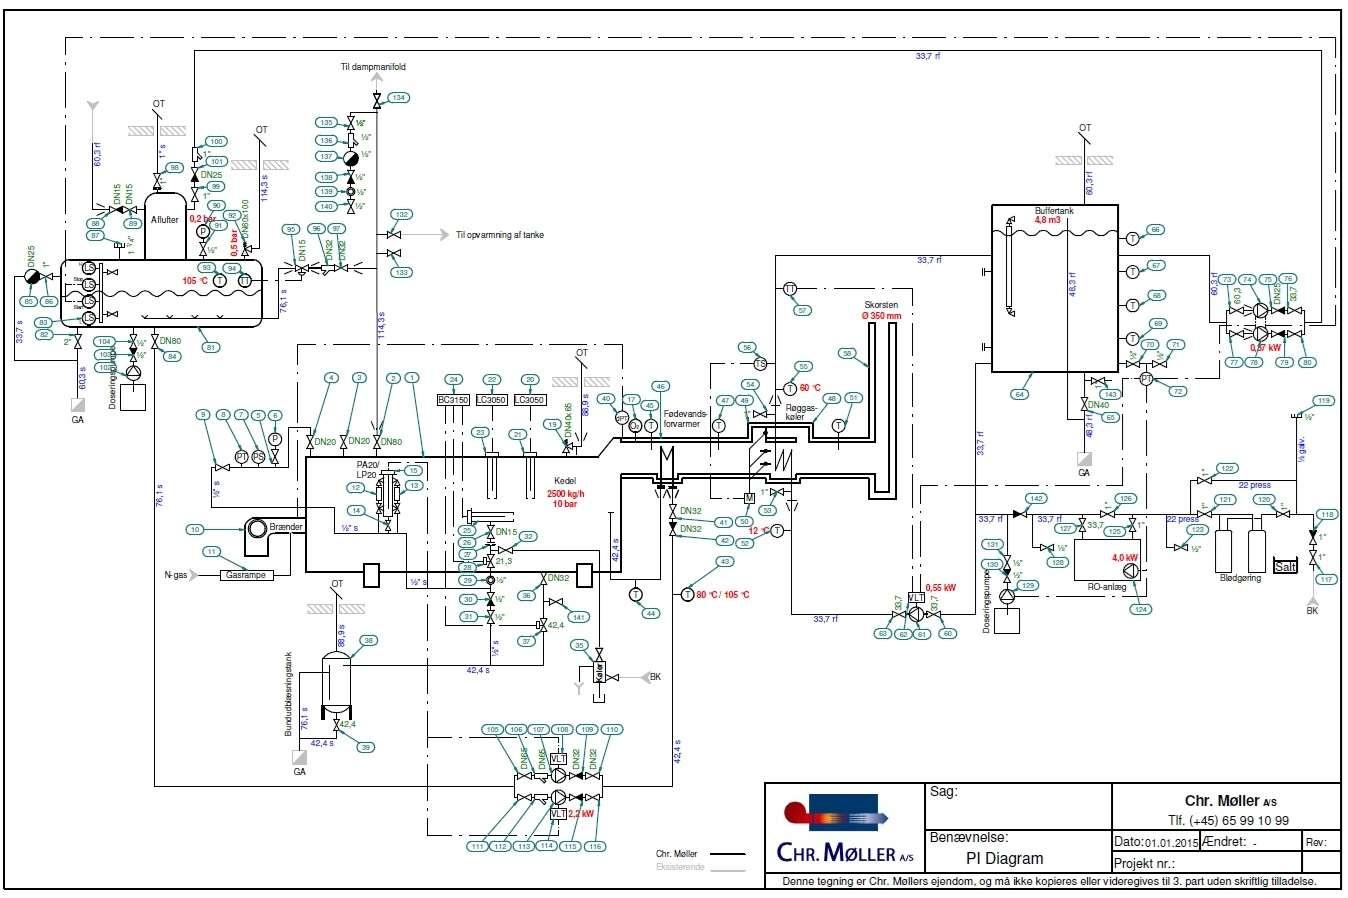 Standard Instrumentation Wiring Diagram Detailed Schematics Basics P I Bendix Ad Block And Schematic Diagrams U2022 Hunter Ceiling Fan